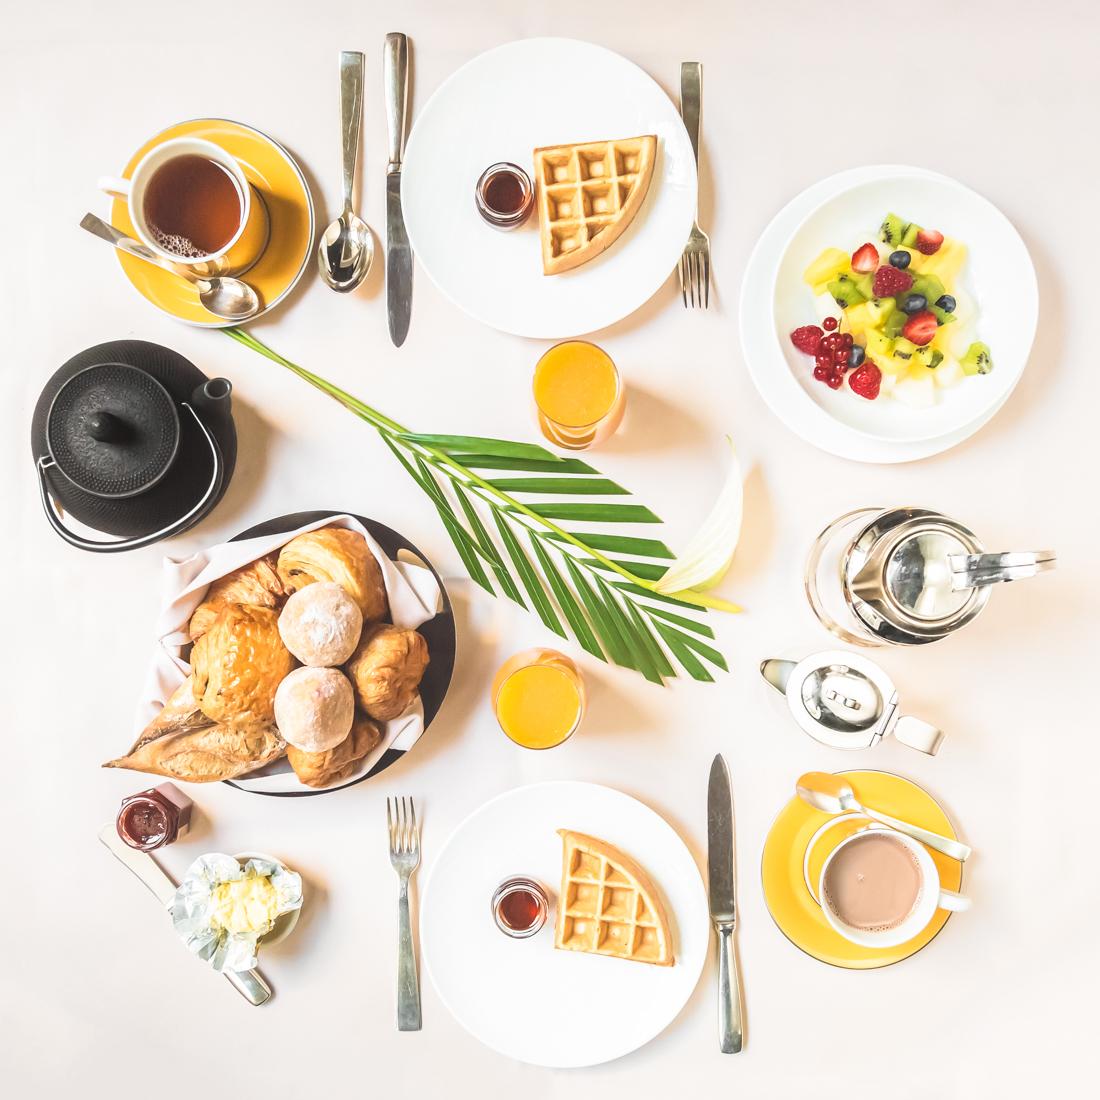 petit-dejeuner-breakfast-room-service-park-hyatt-paris-vendome-copyright-pauline-paulinefashionblog-com-1-2